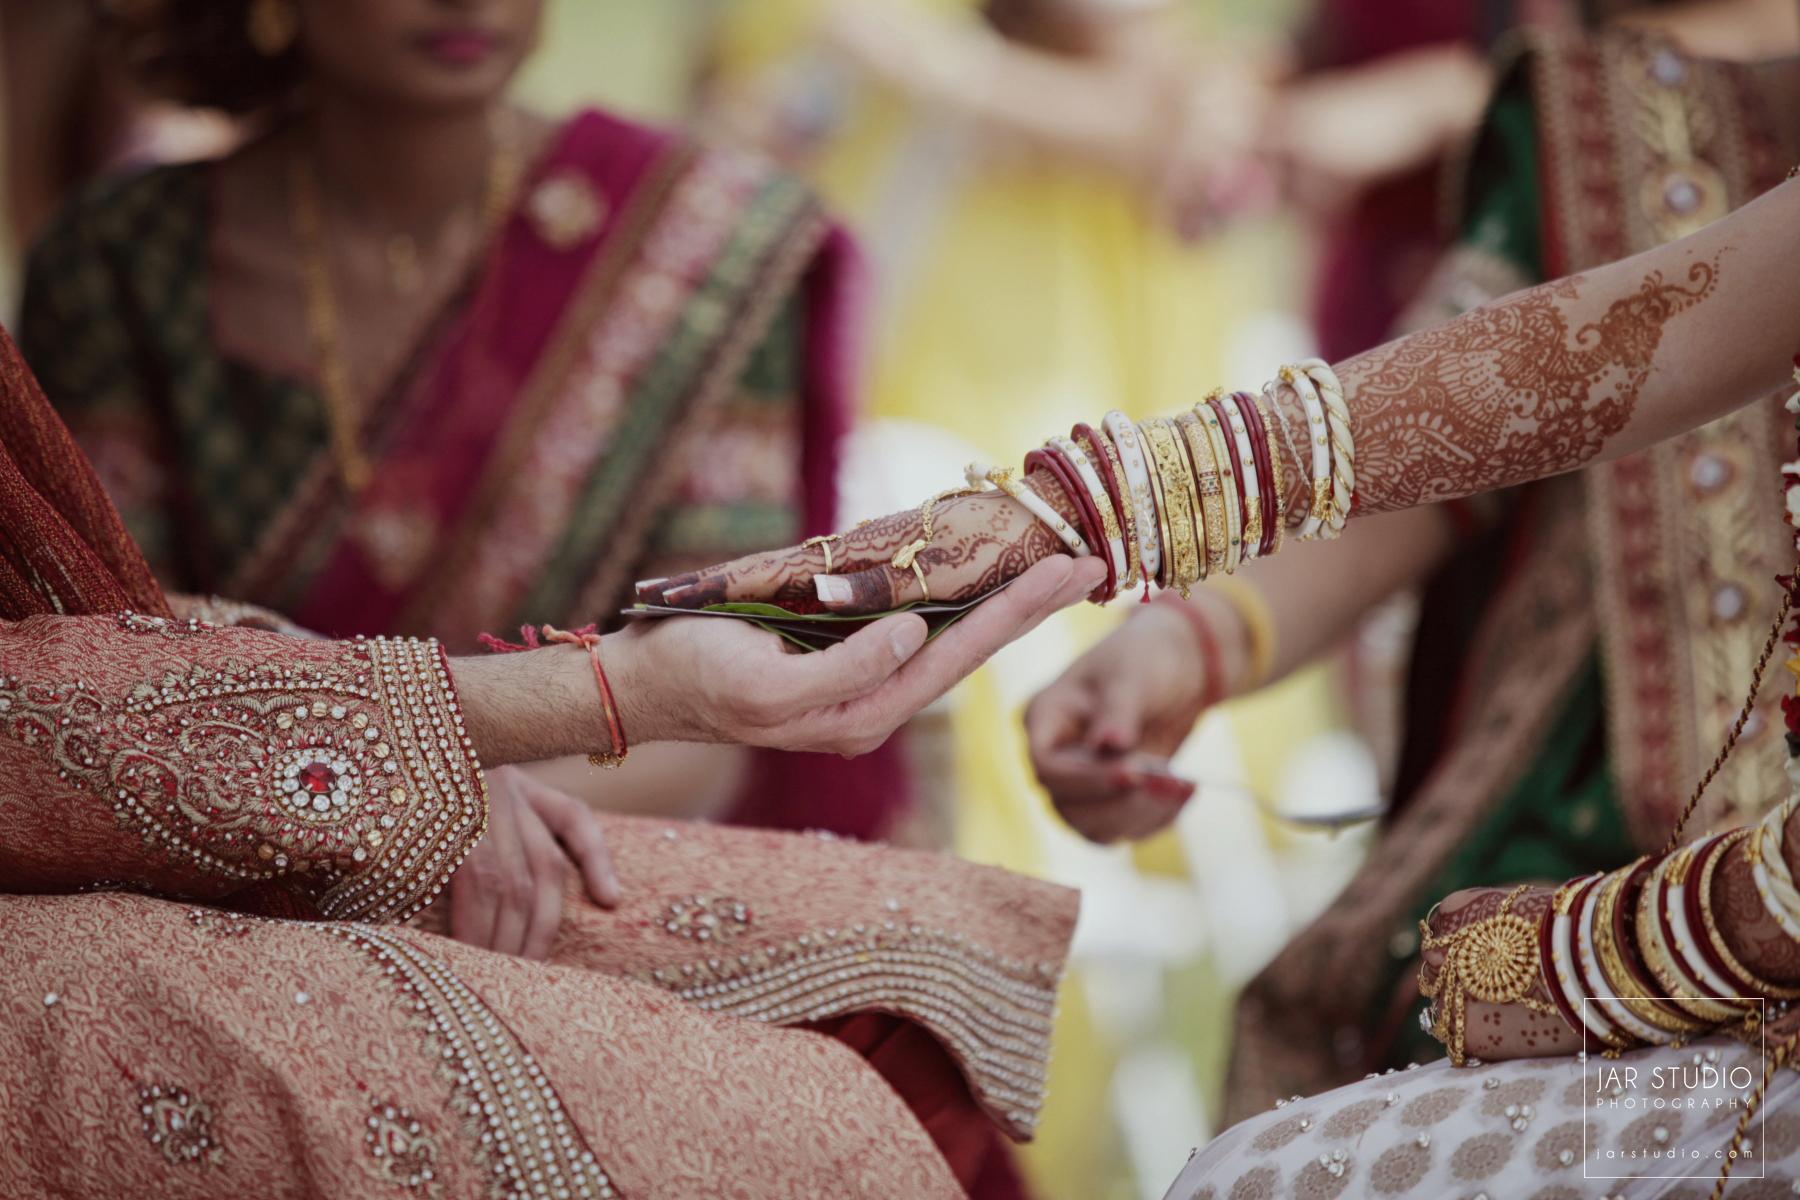 37-hindu-wedding-ceremony-jarstudio-photography-orlando-fl.JPG